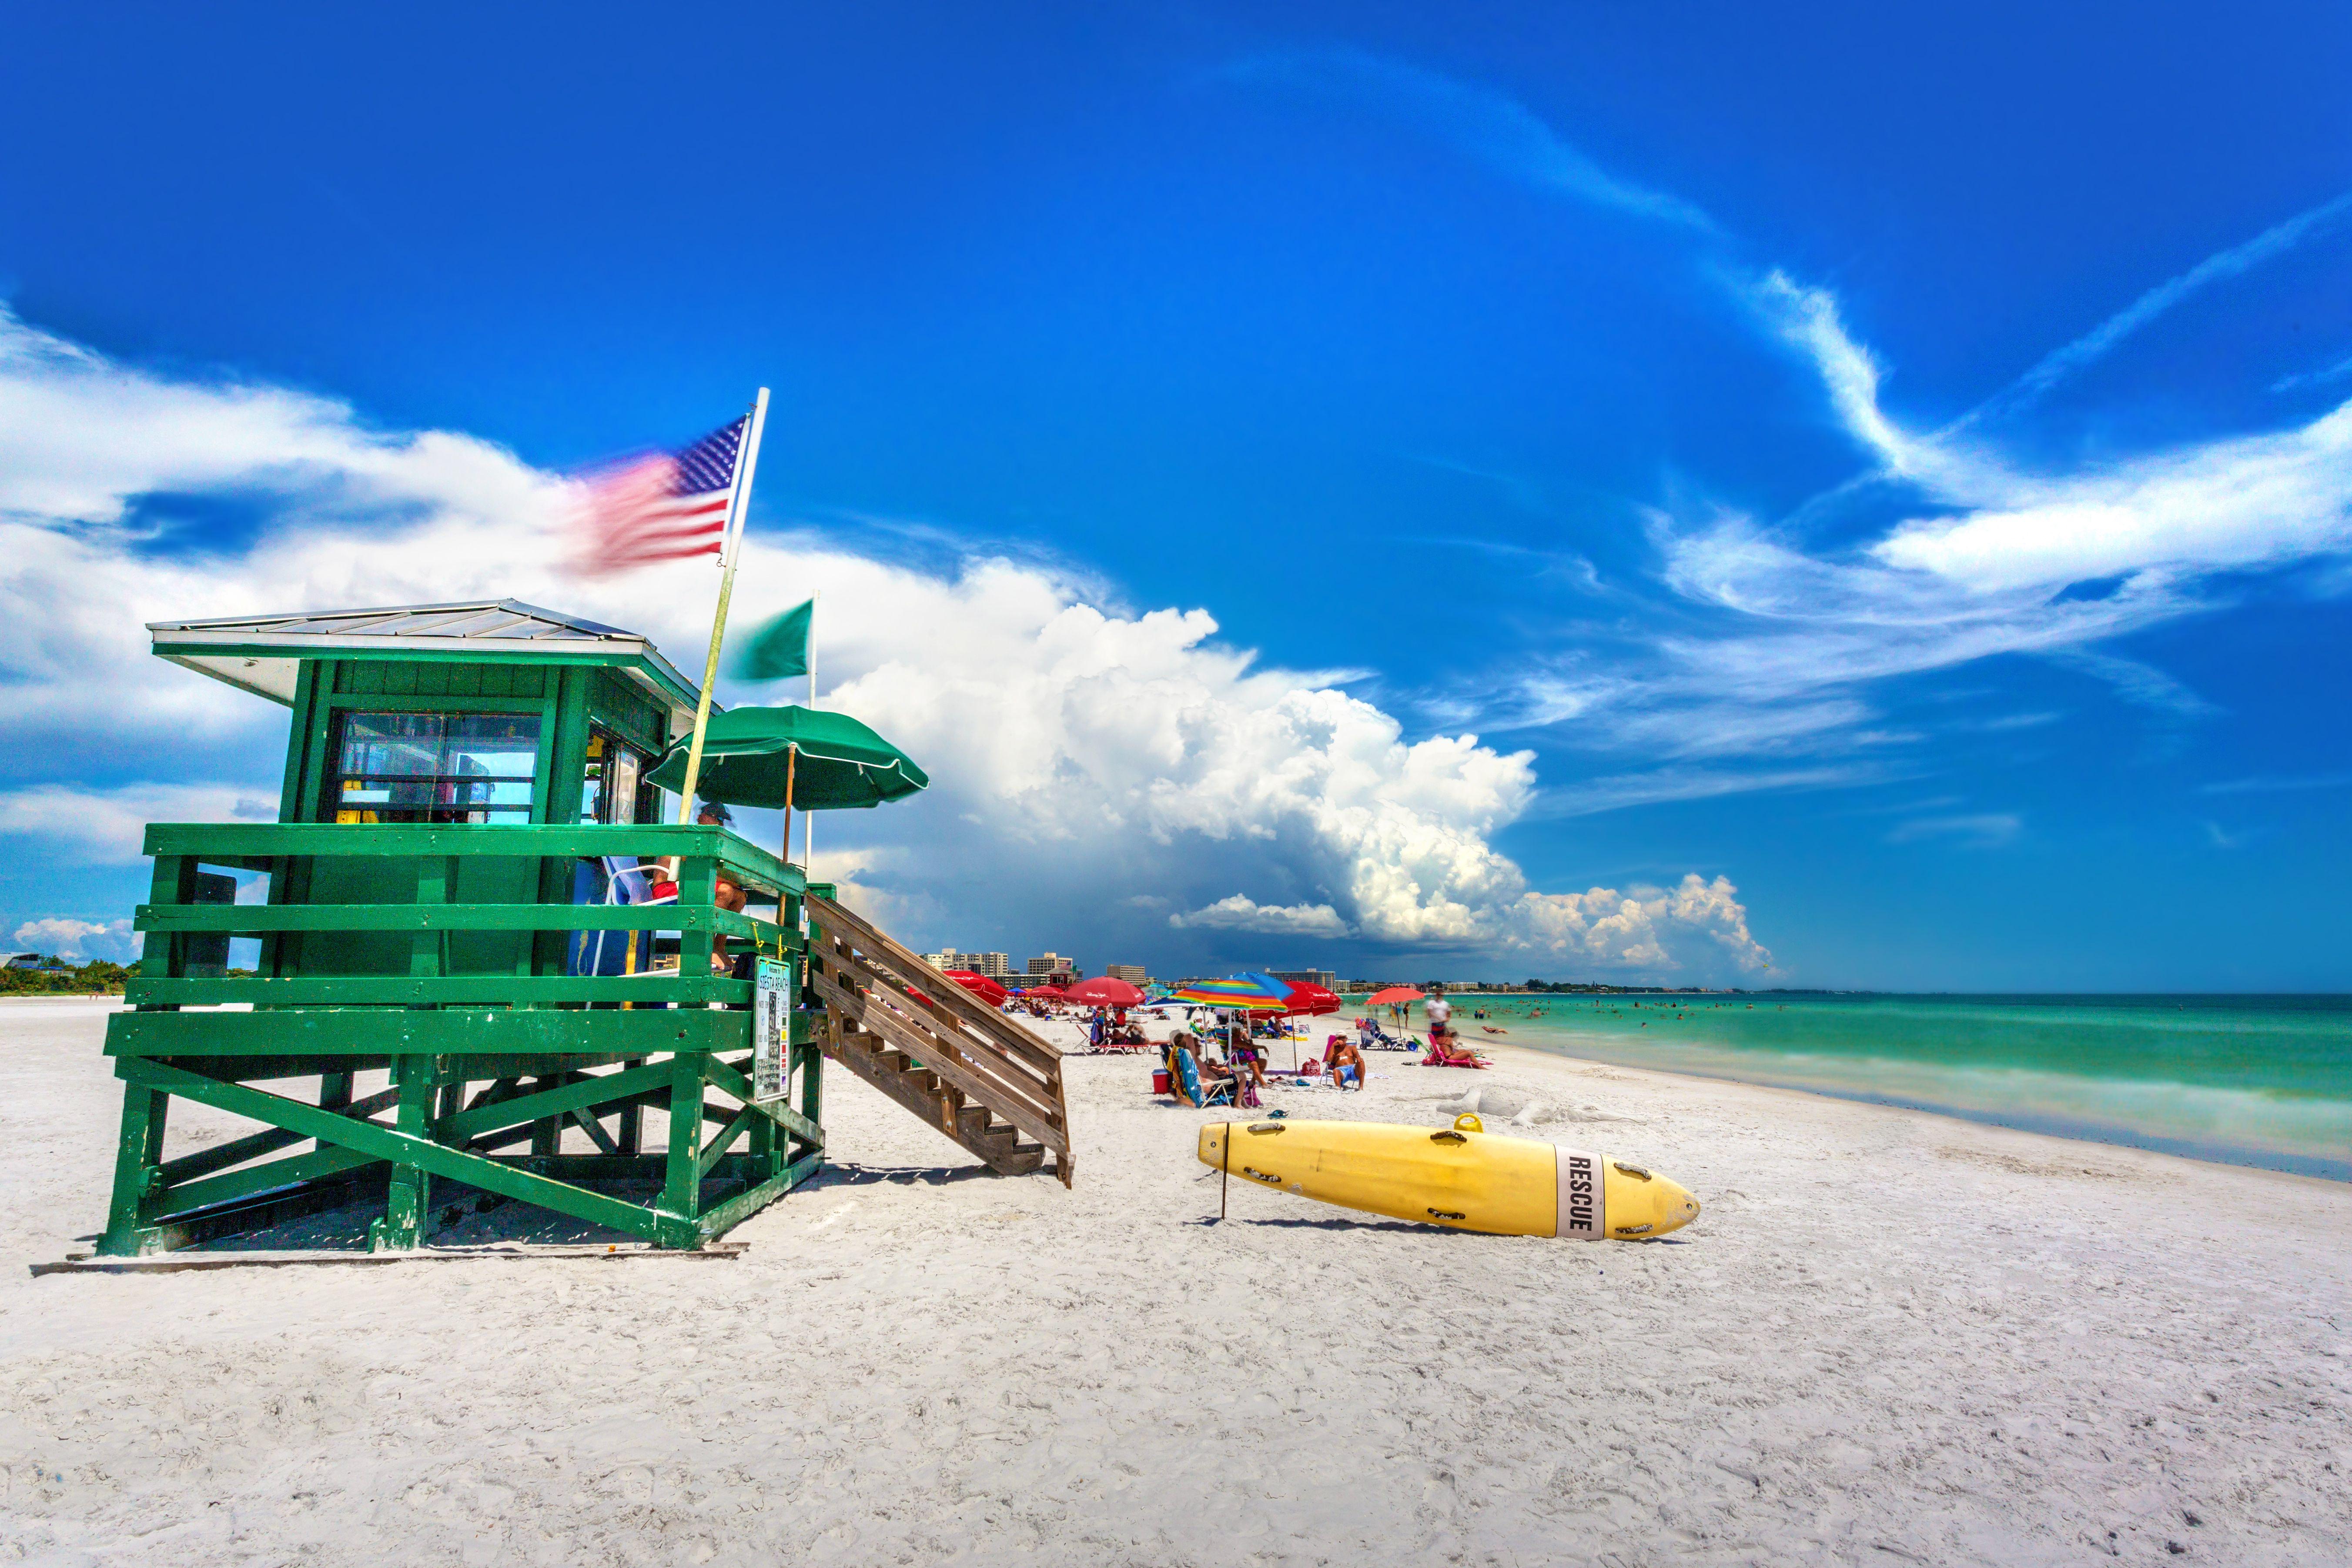 Kid Friendly Attractions On Siesta Key Florida